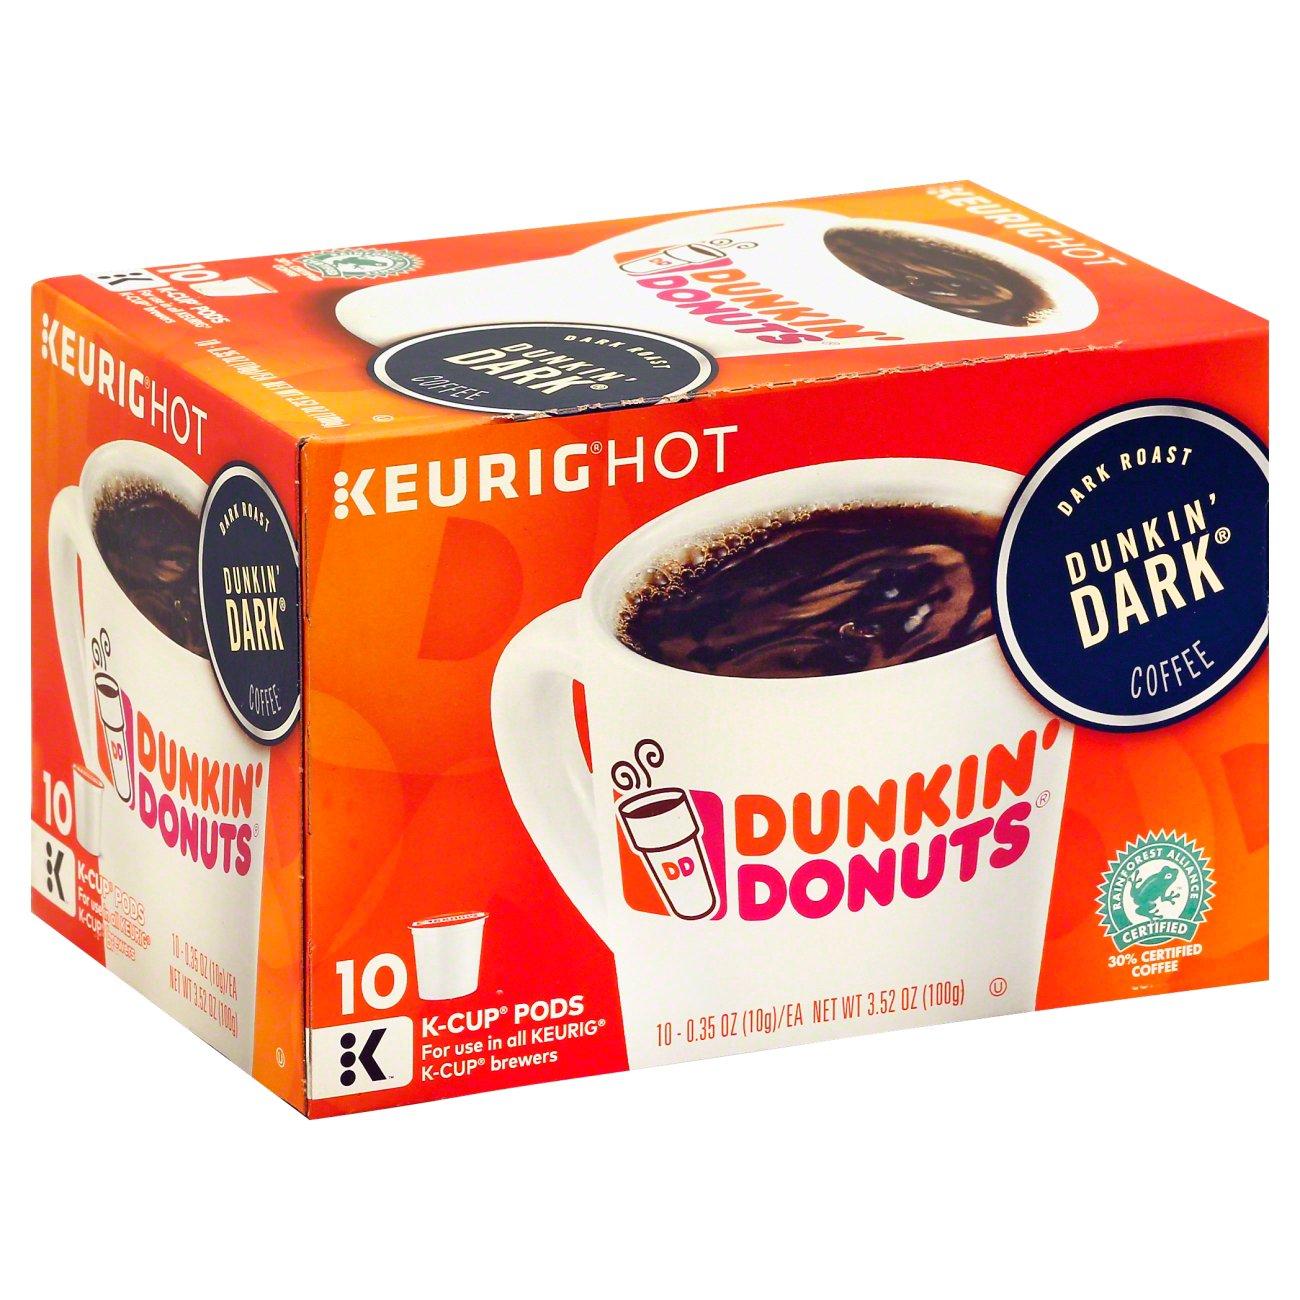 Dunkin' Donuts Dunkin' Dark Dark Roast Single Serve Coffee ...